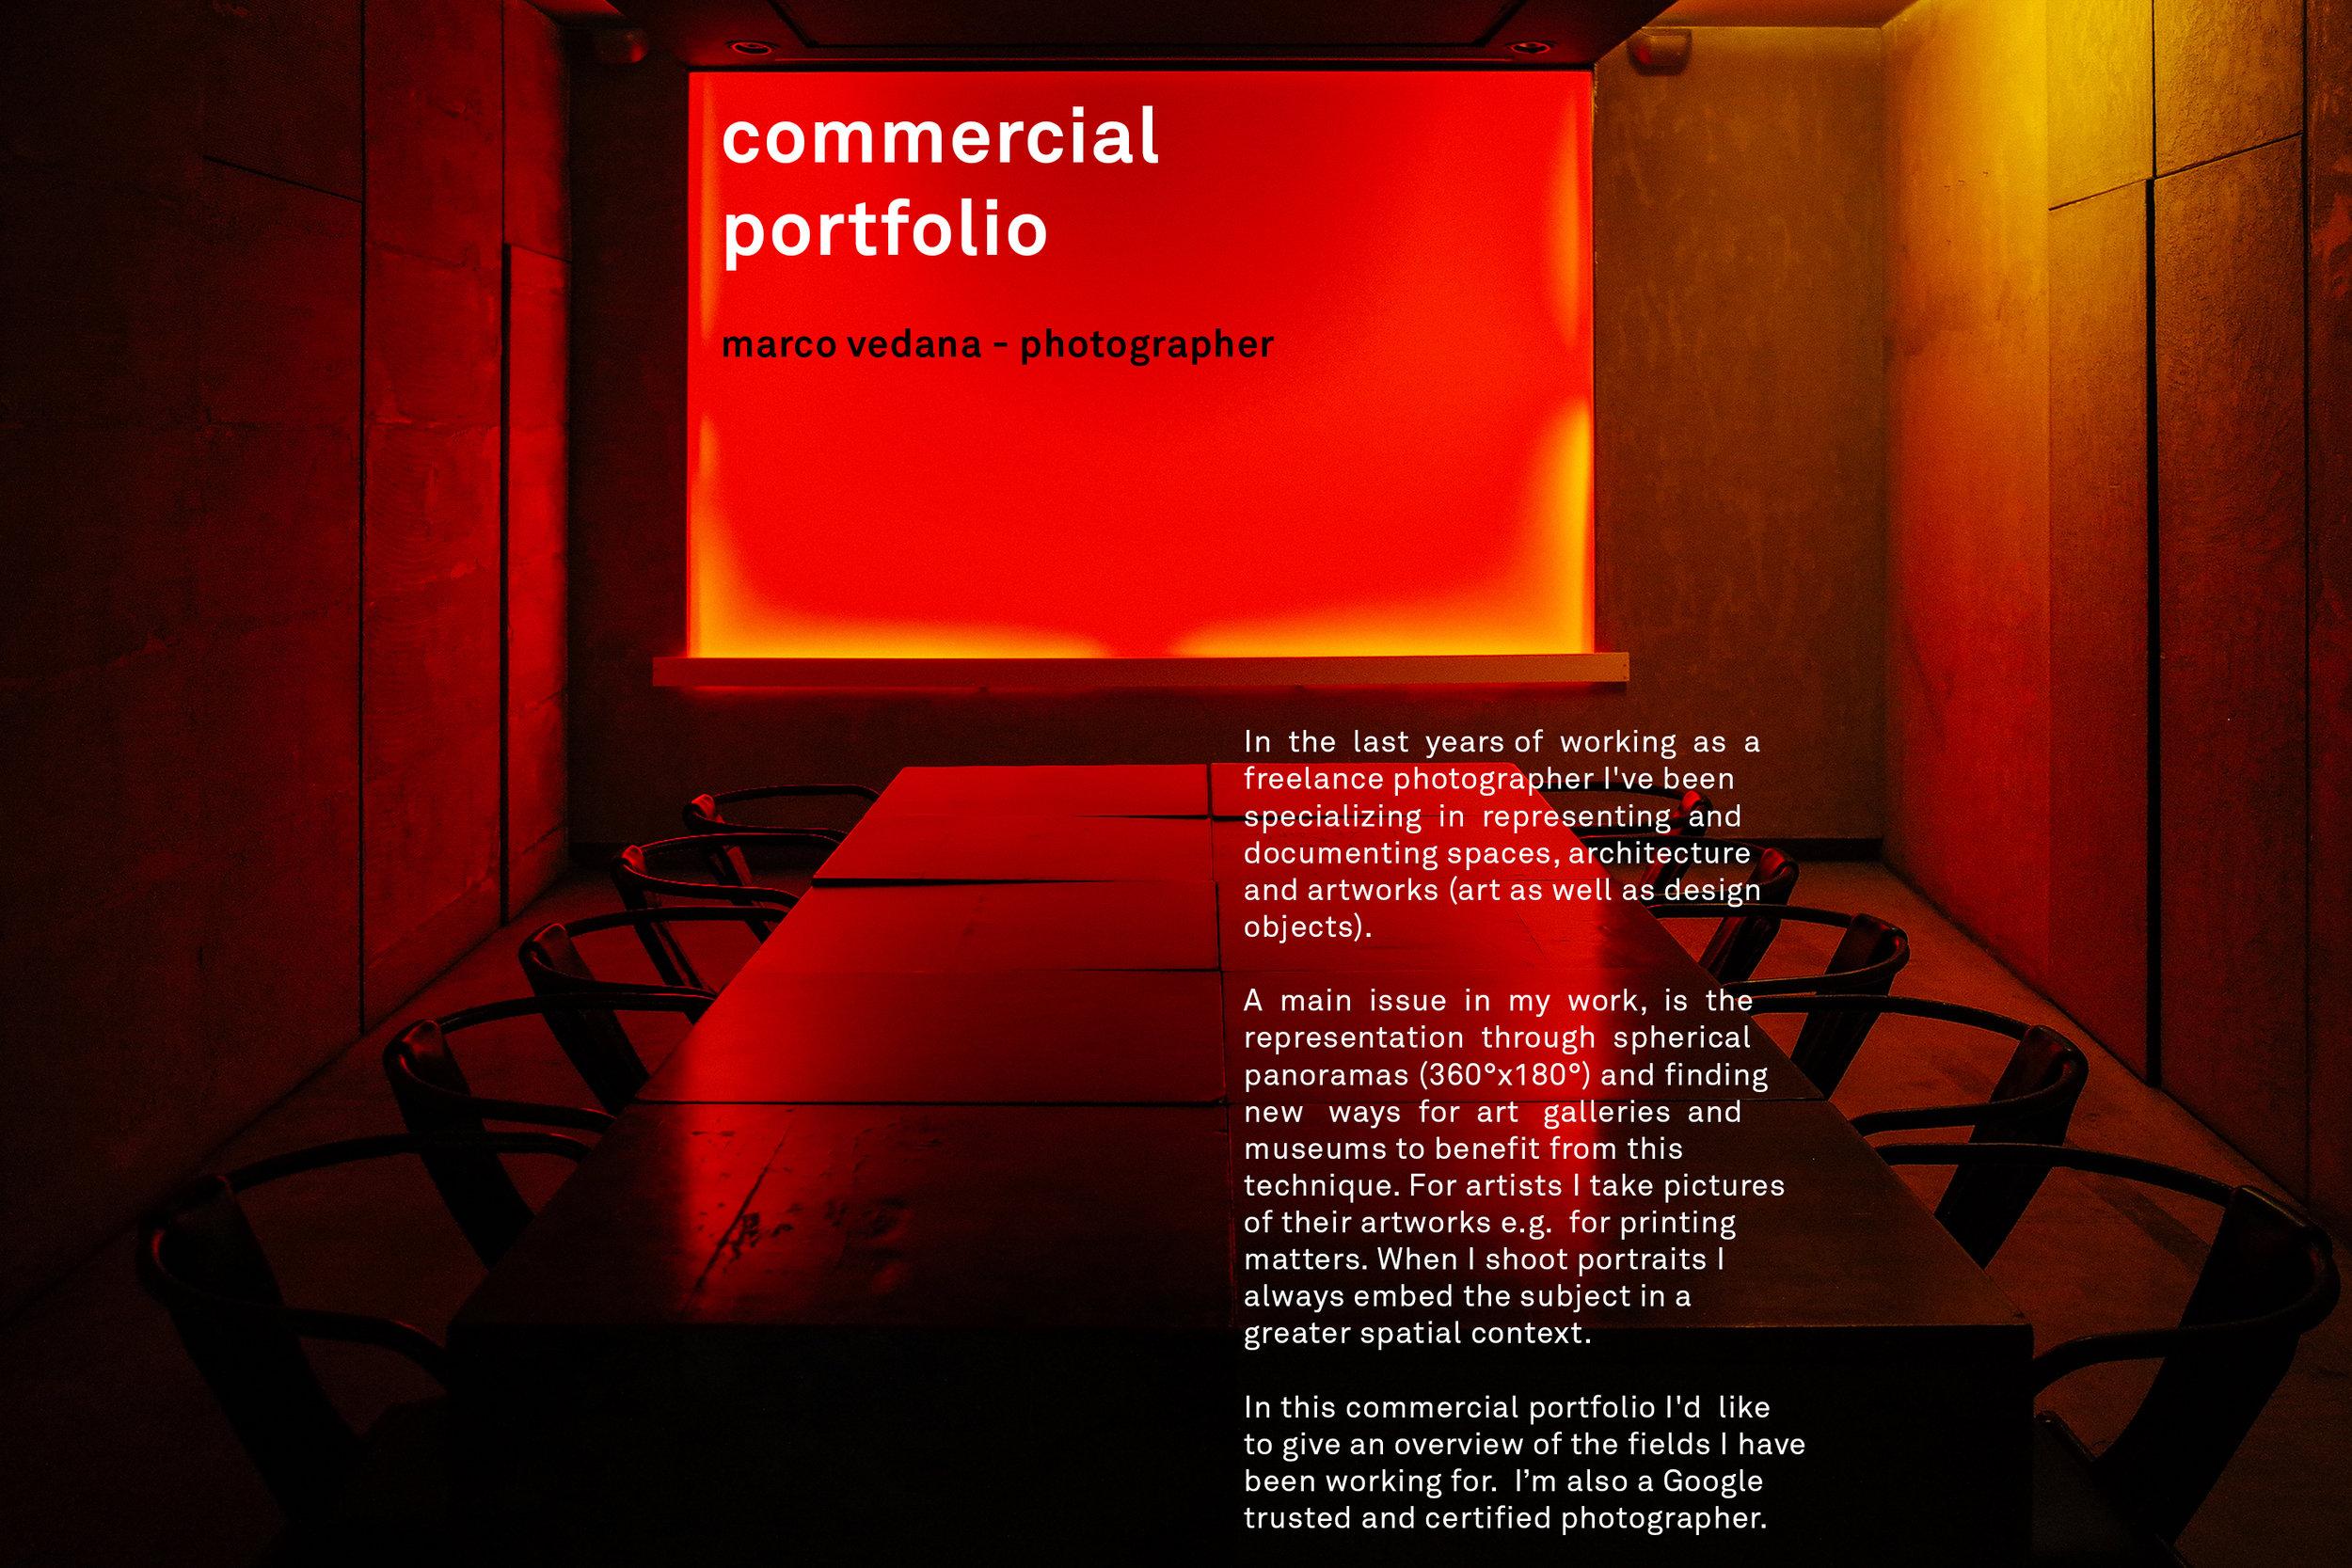 commercial_portfolio_marco_vedana.jpg